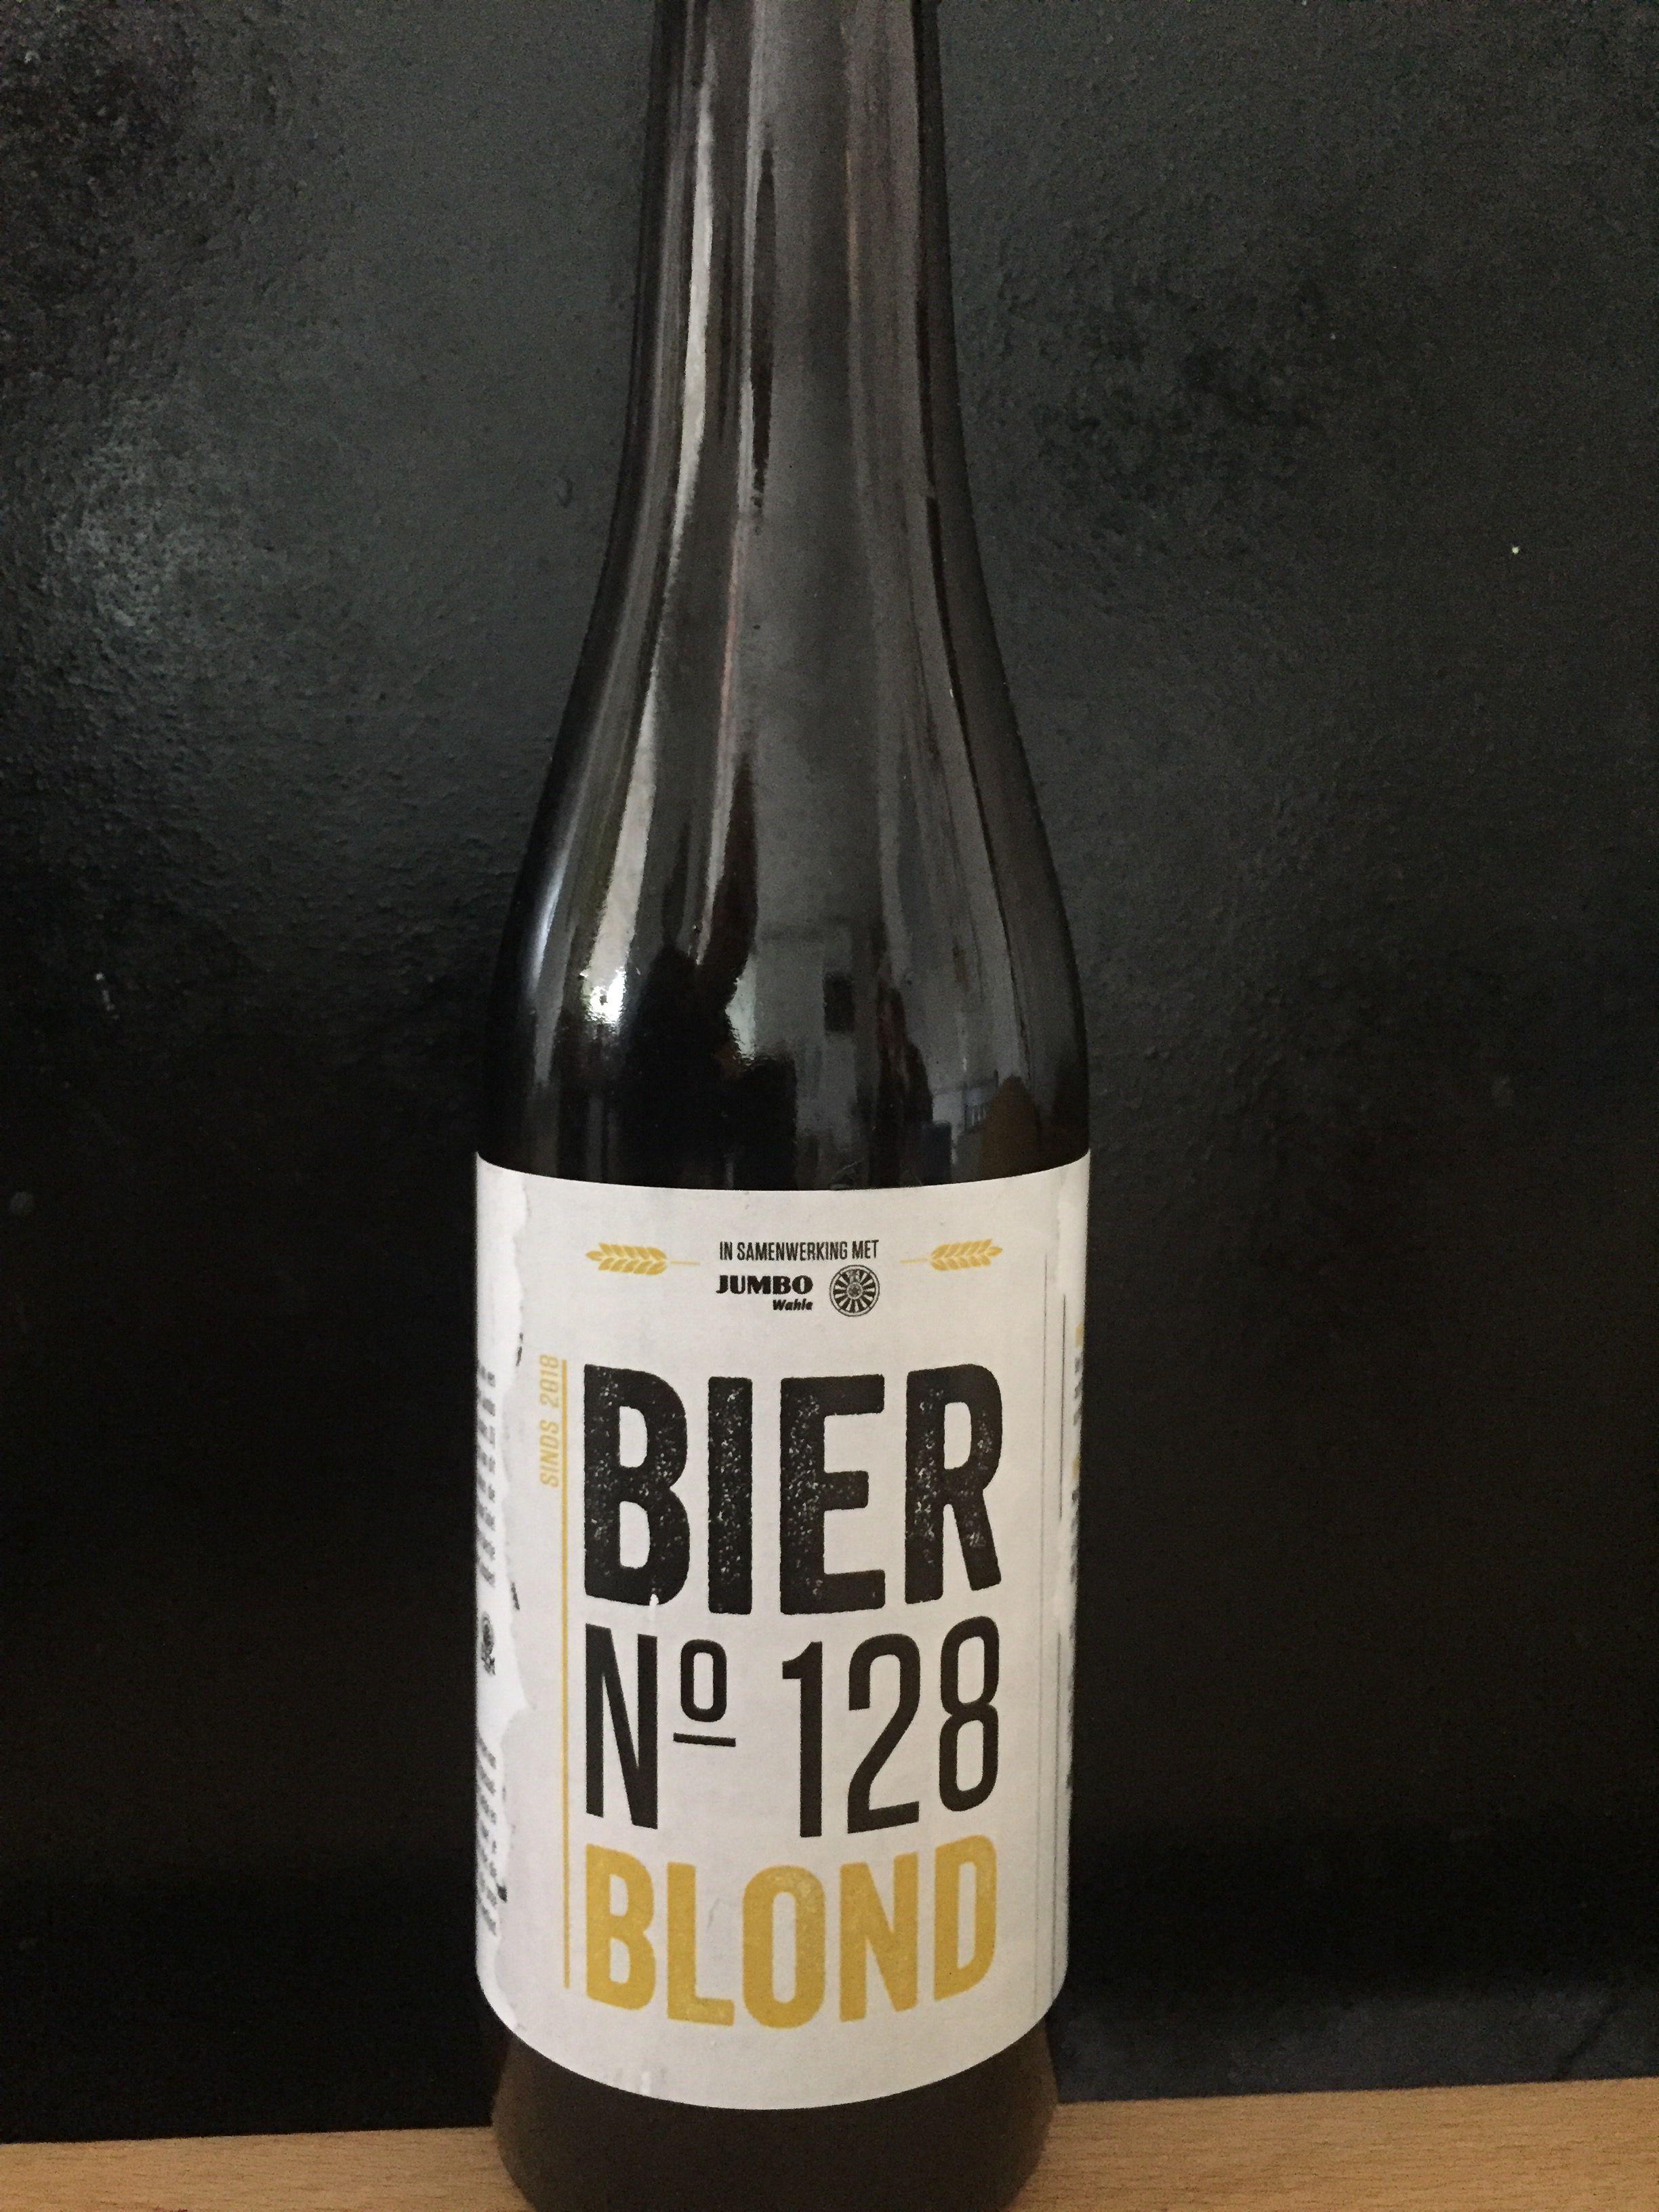 Ronde Tafel Leusden.Bier No 128 Blond 33cl 6 2 Ebu 28 Ebc 12 Ronde Tafel